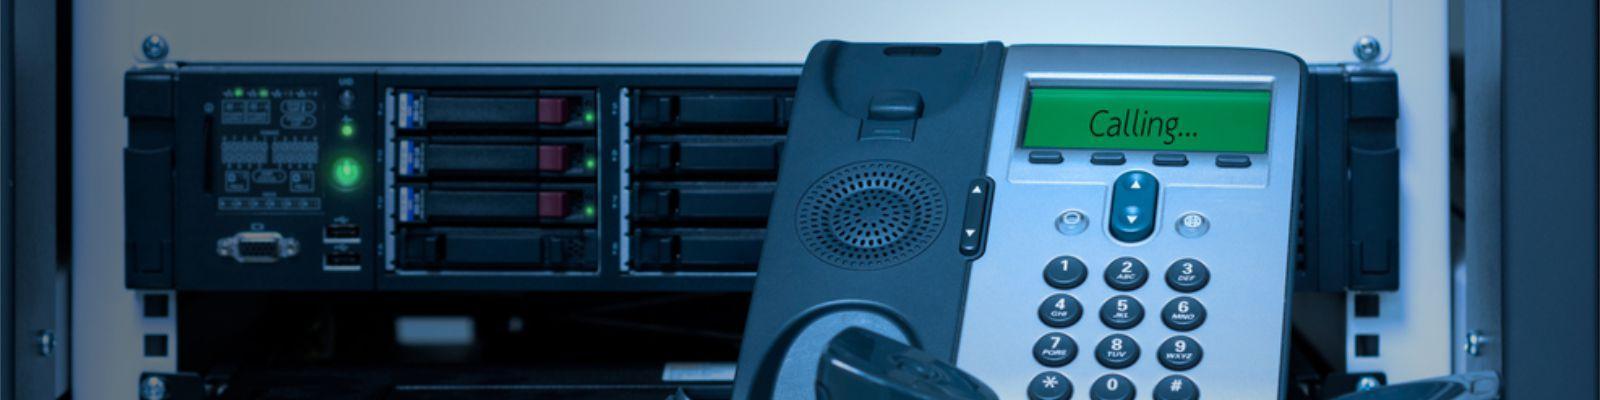 Parallex_VoIP System Maintenance